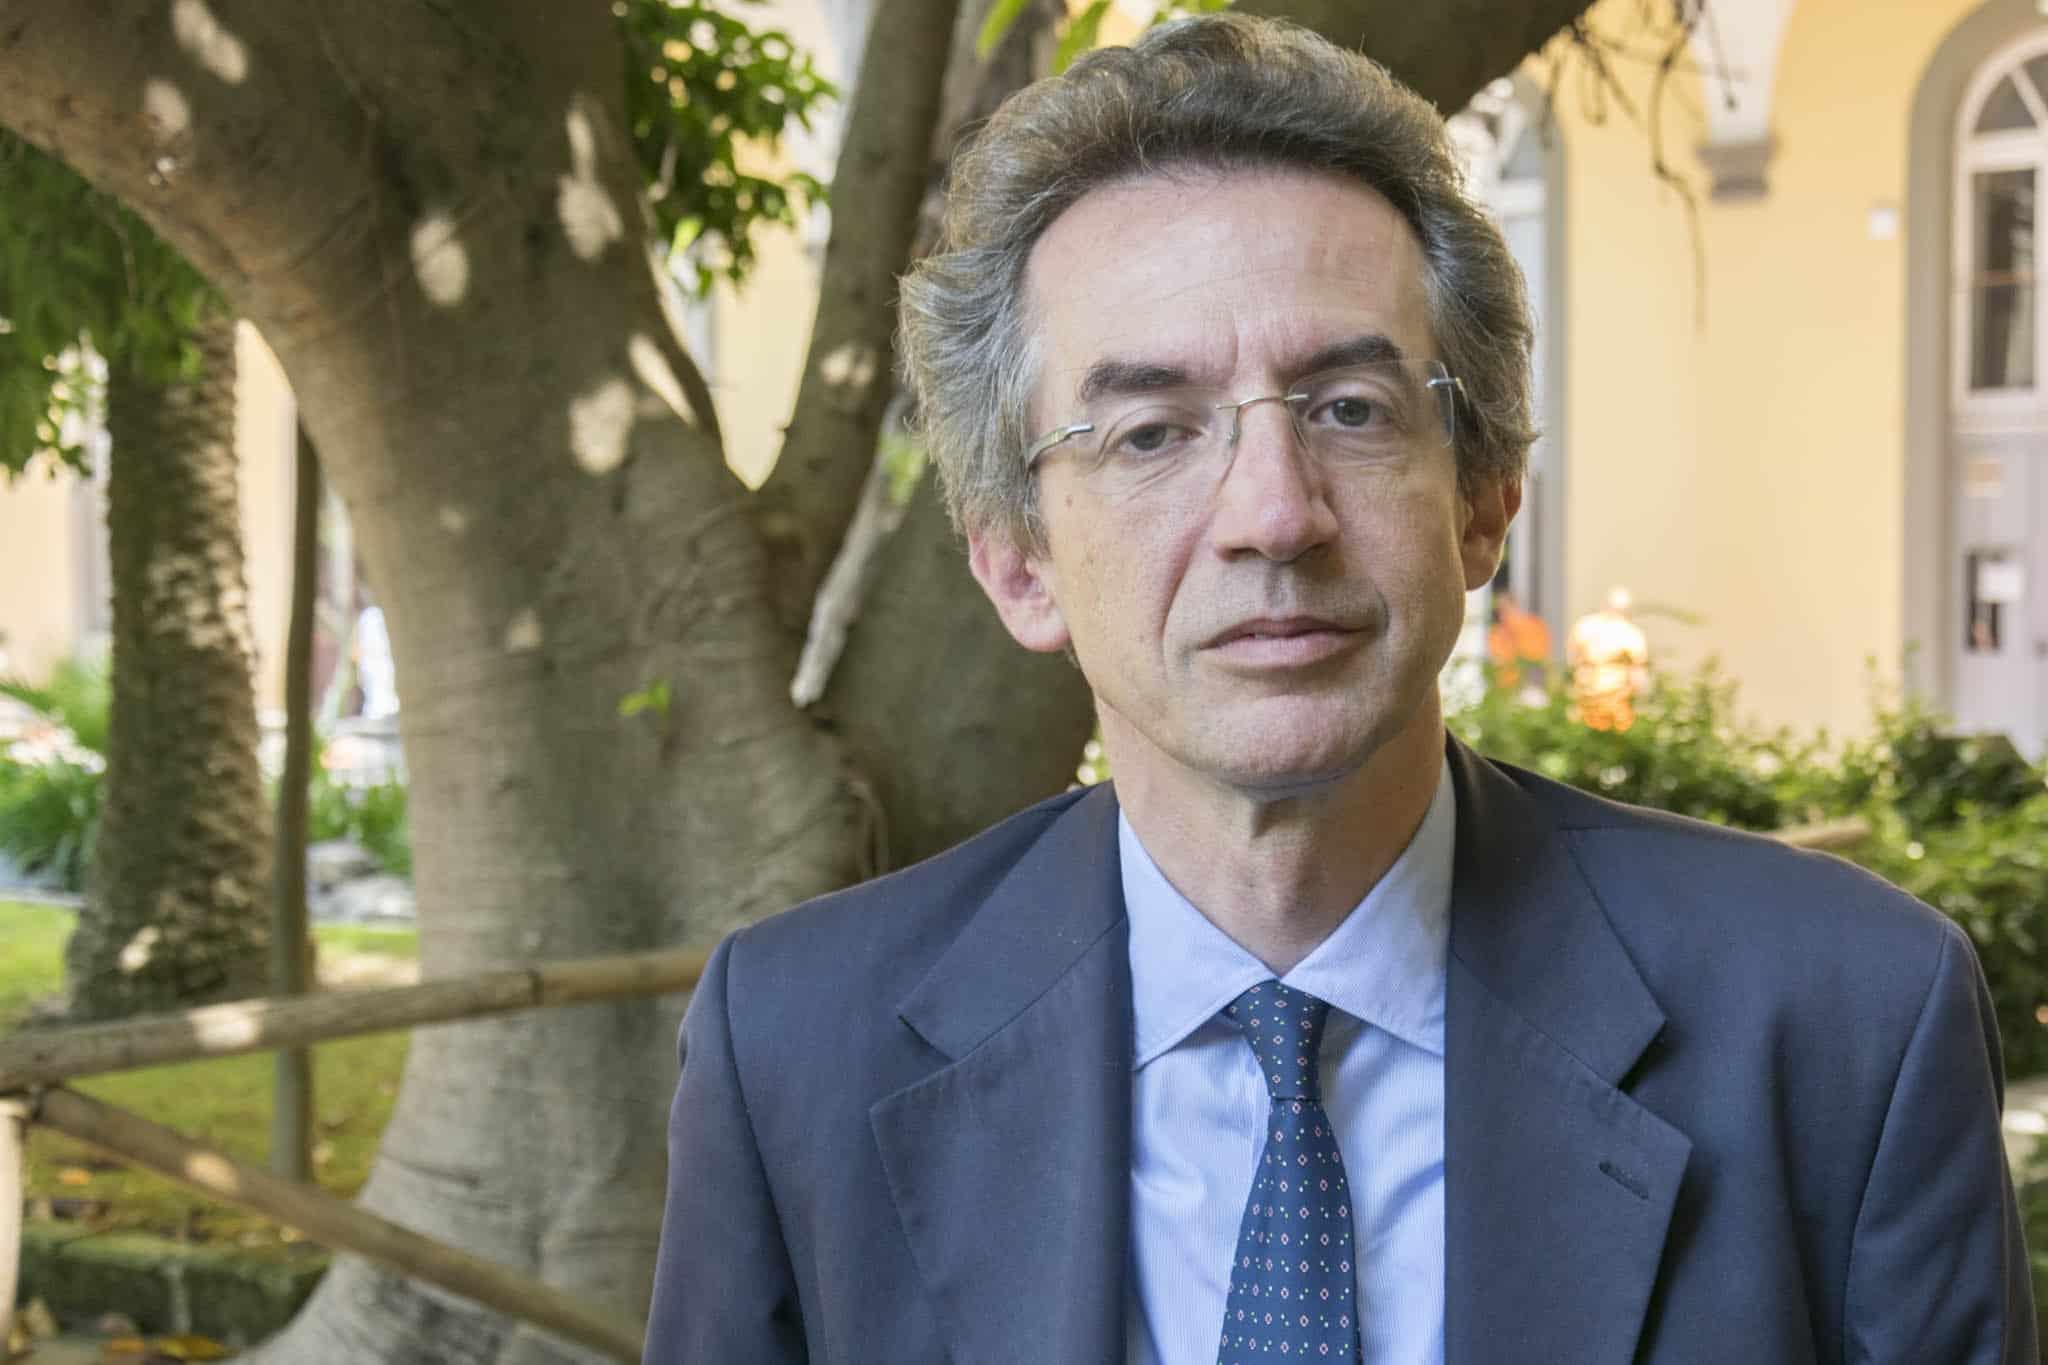 Gaetano Manfredi (Foto di Gabriele Arenare)